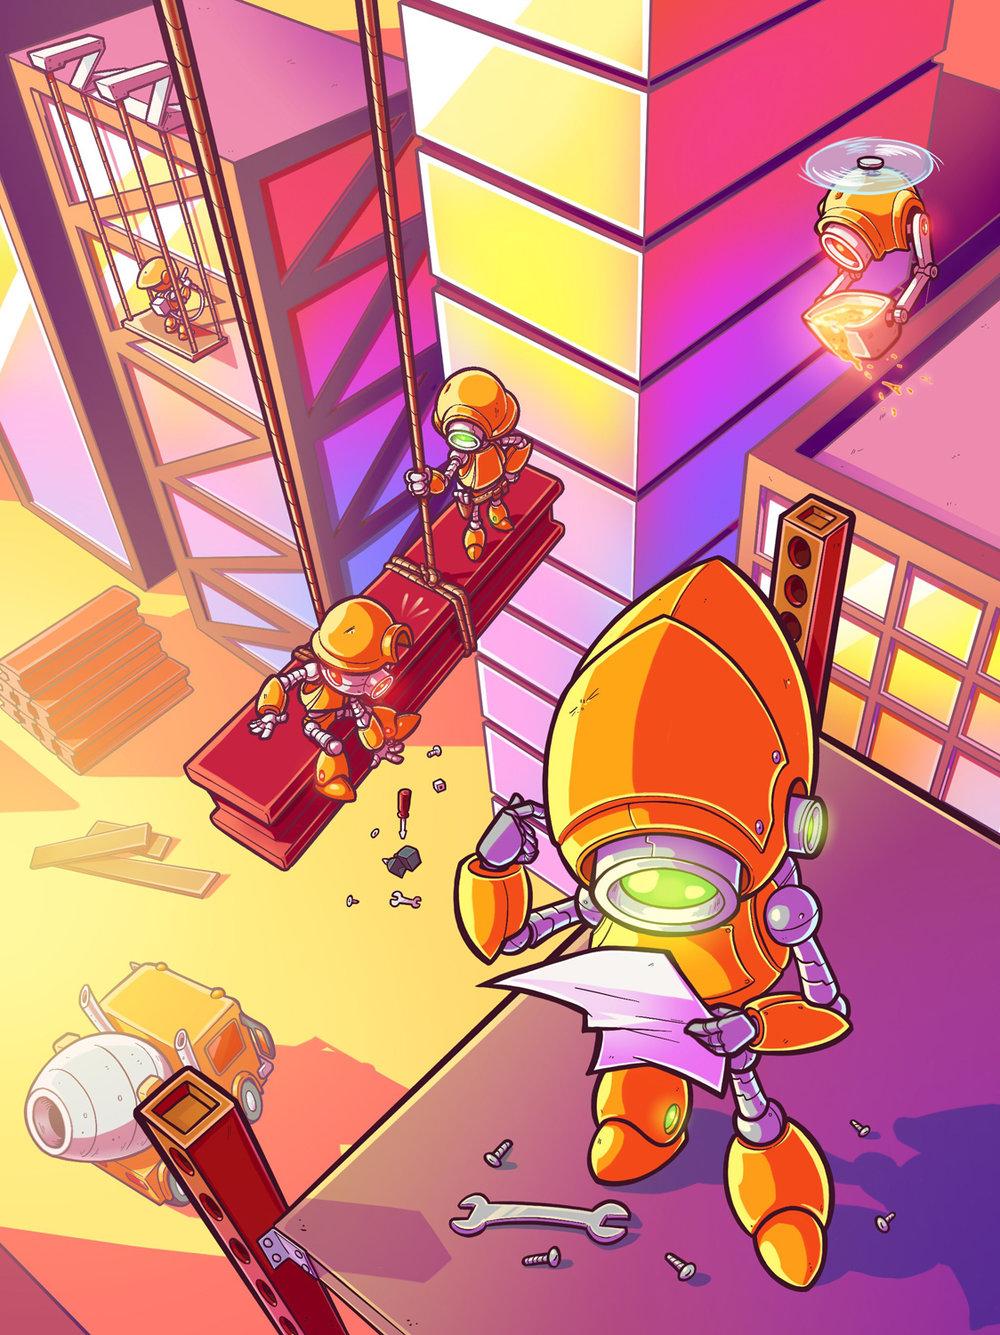 ConstructionRobots.jpg